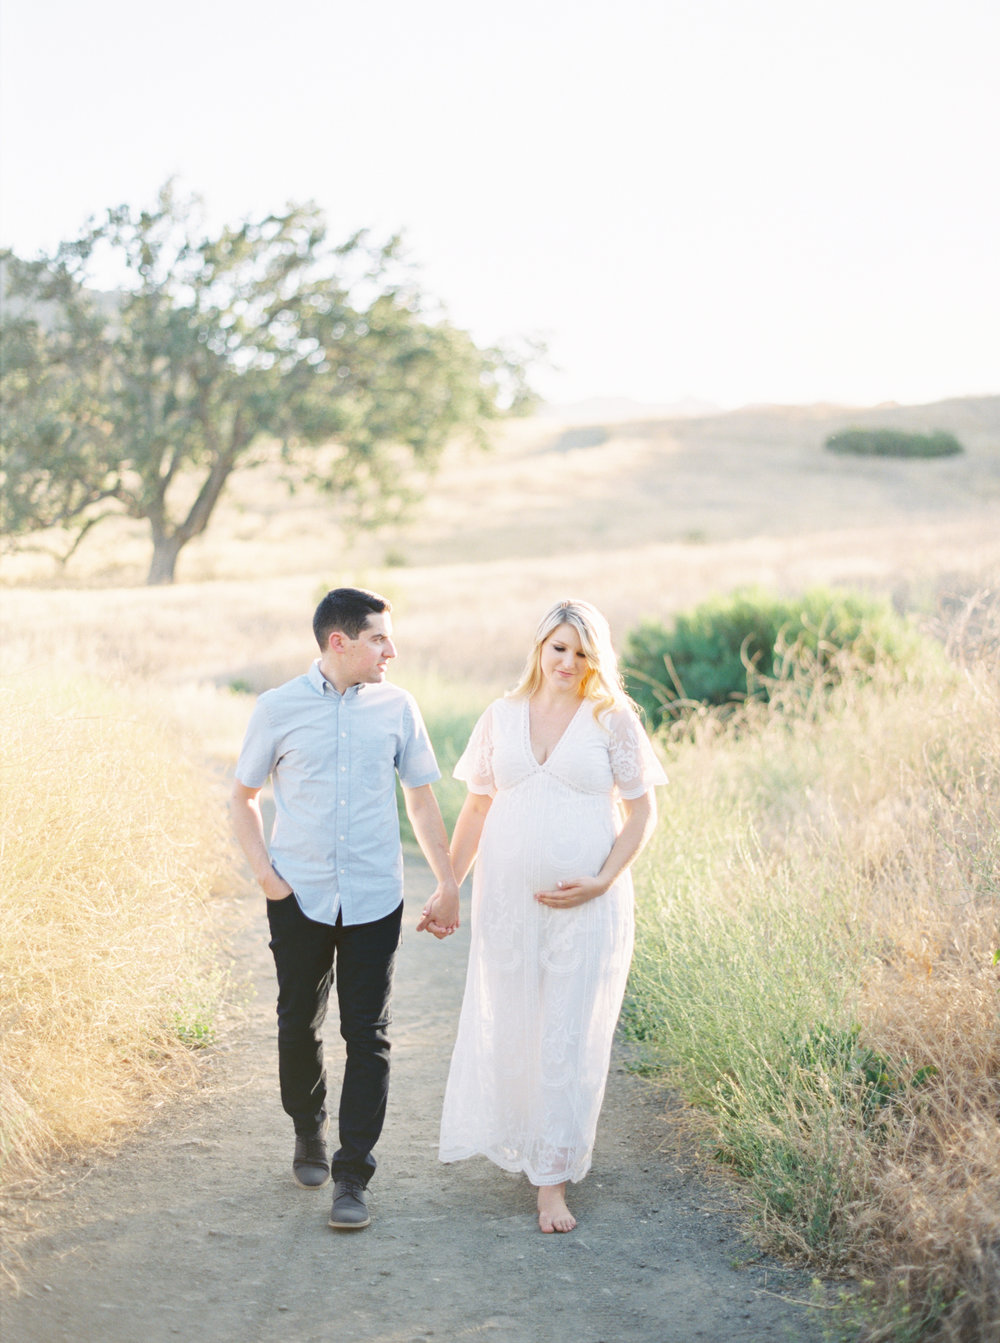 Rachel Owens Photography - Malibu Creek - Film Photography-16.jpg